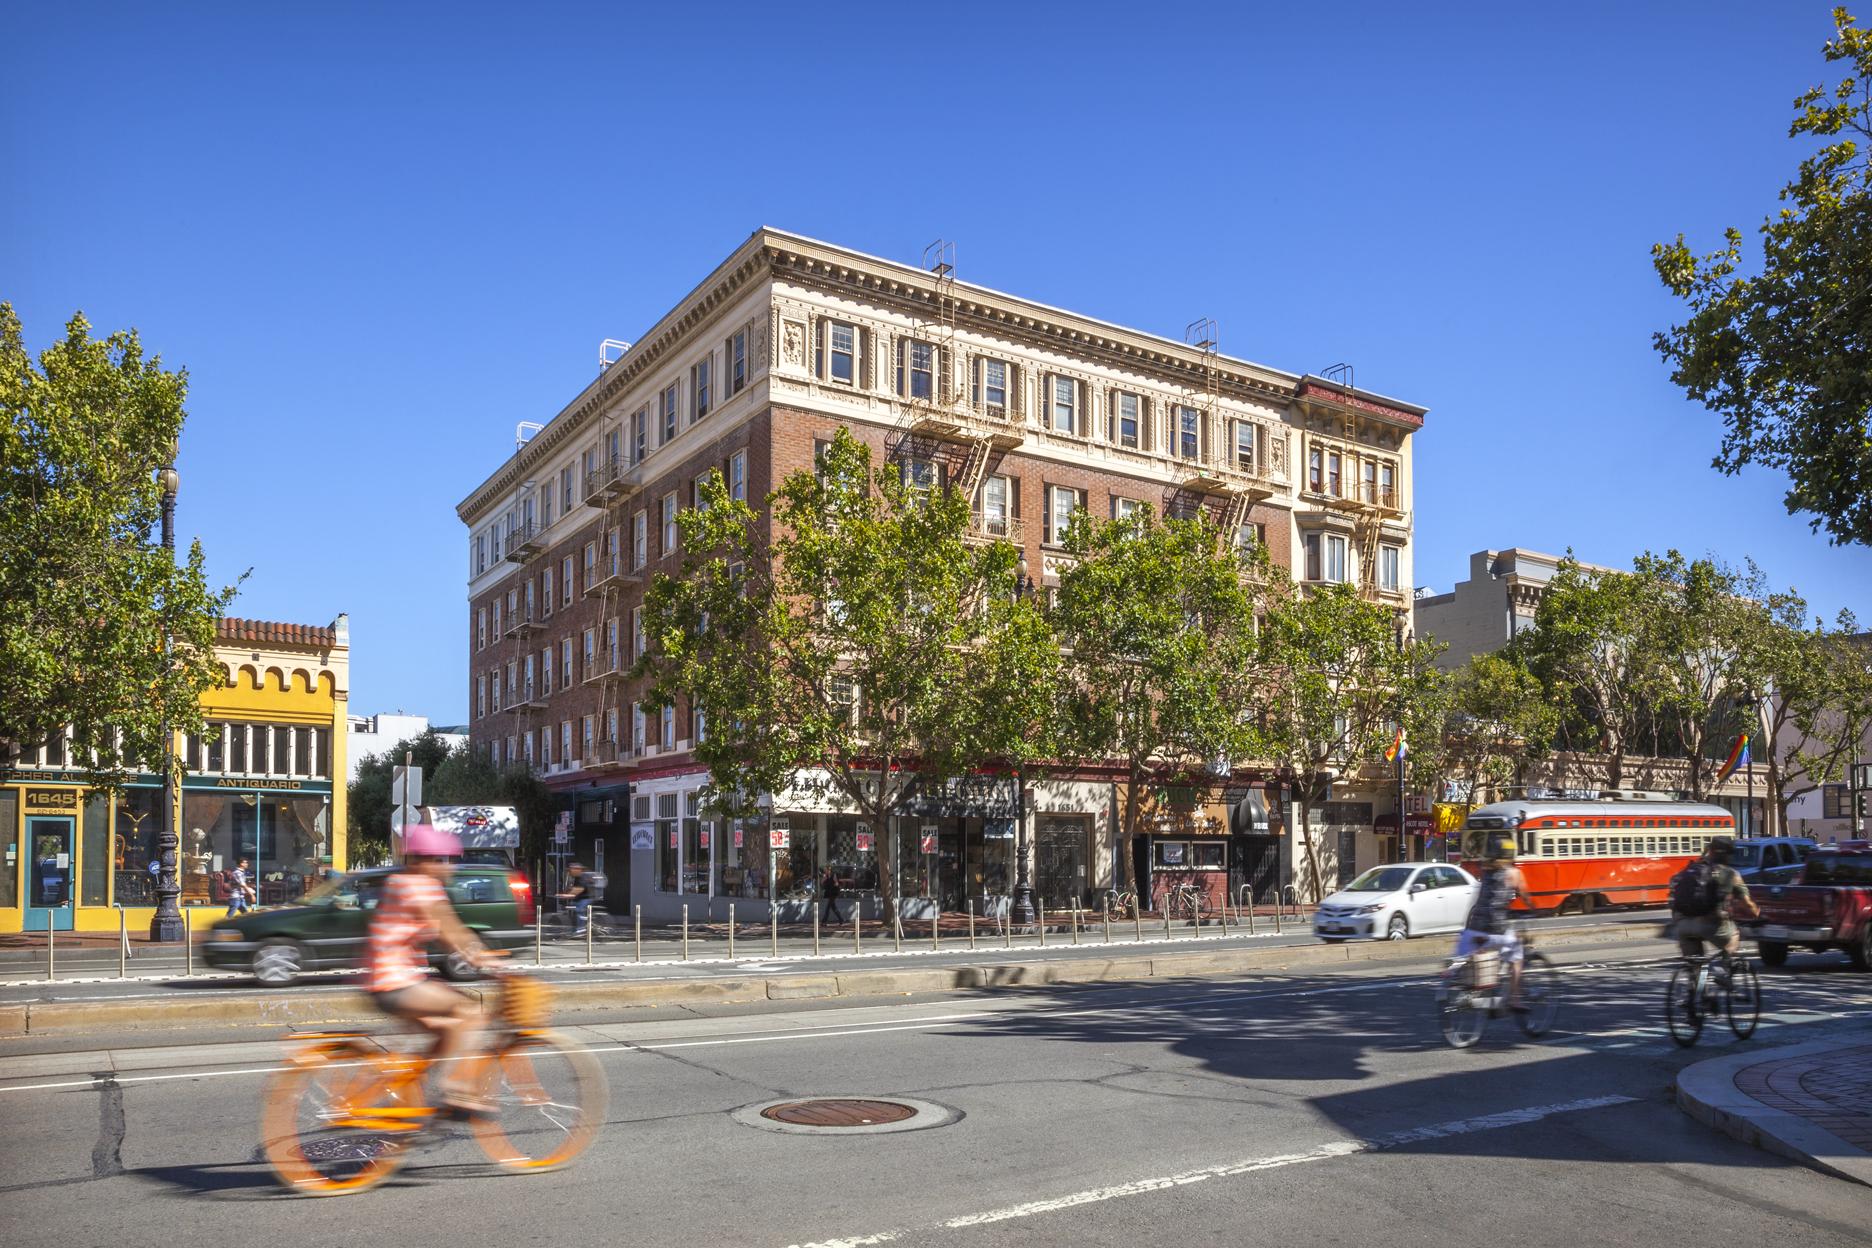 San Francisco Property Management Firm Gaetani Celebrates 75th Anniversary